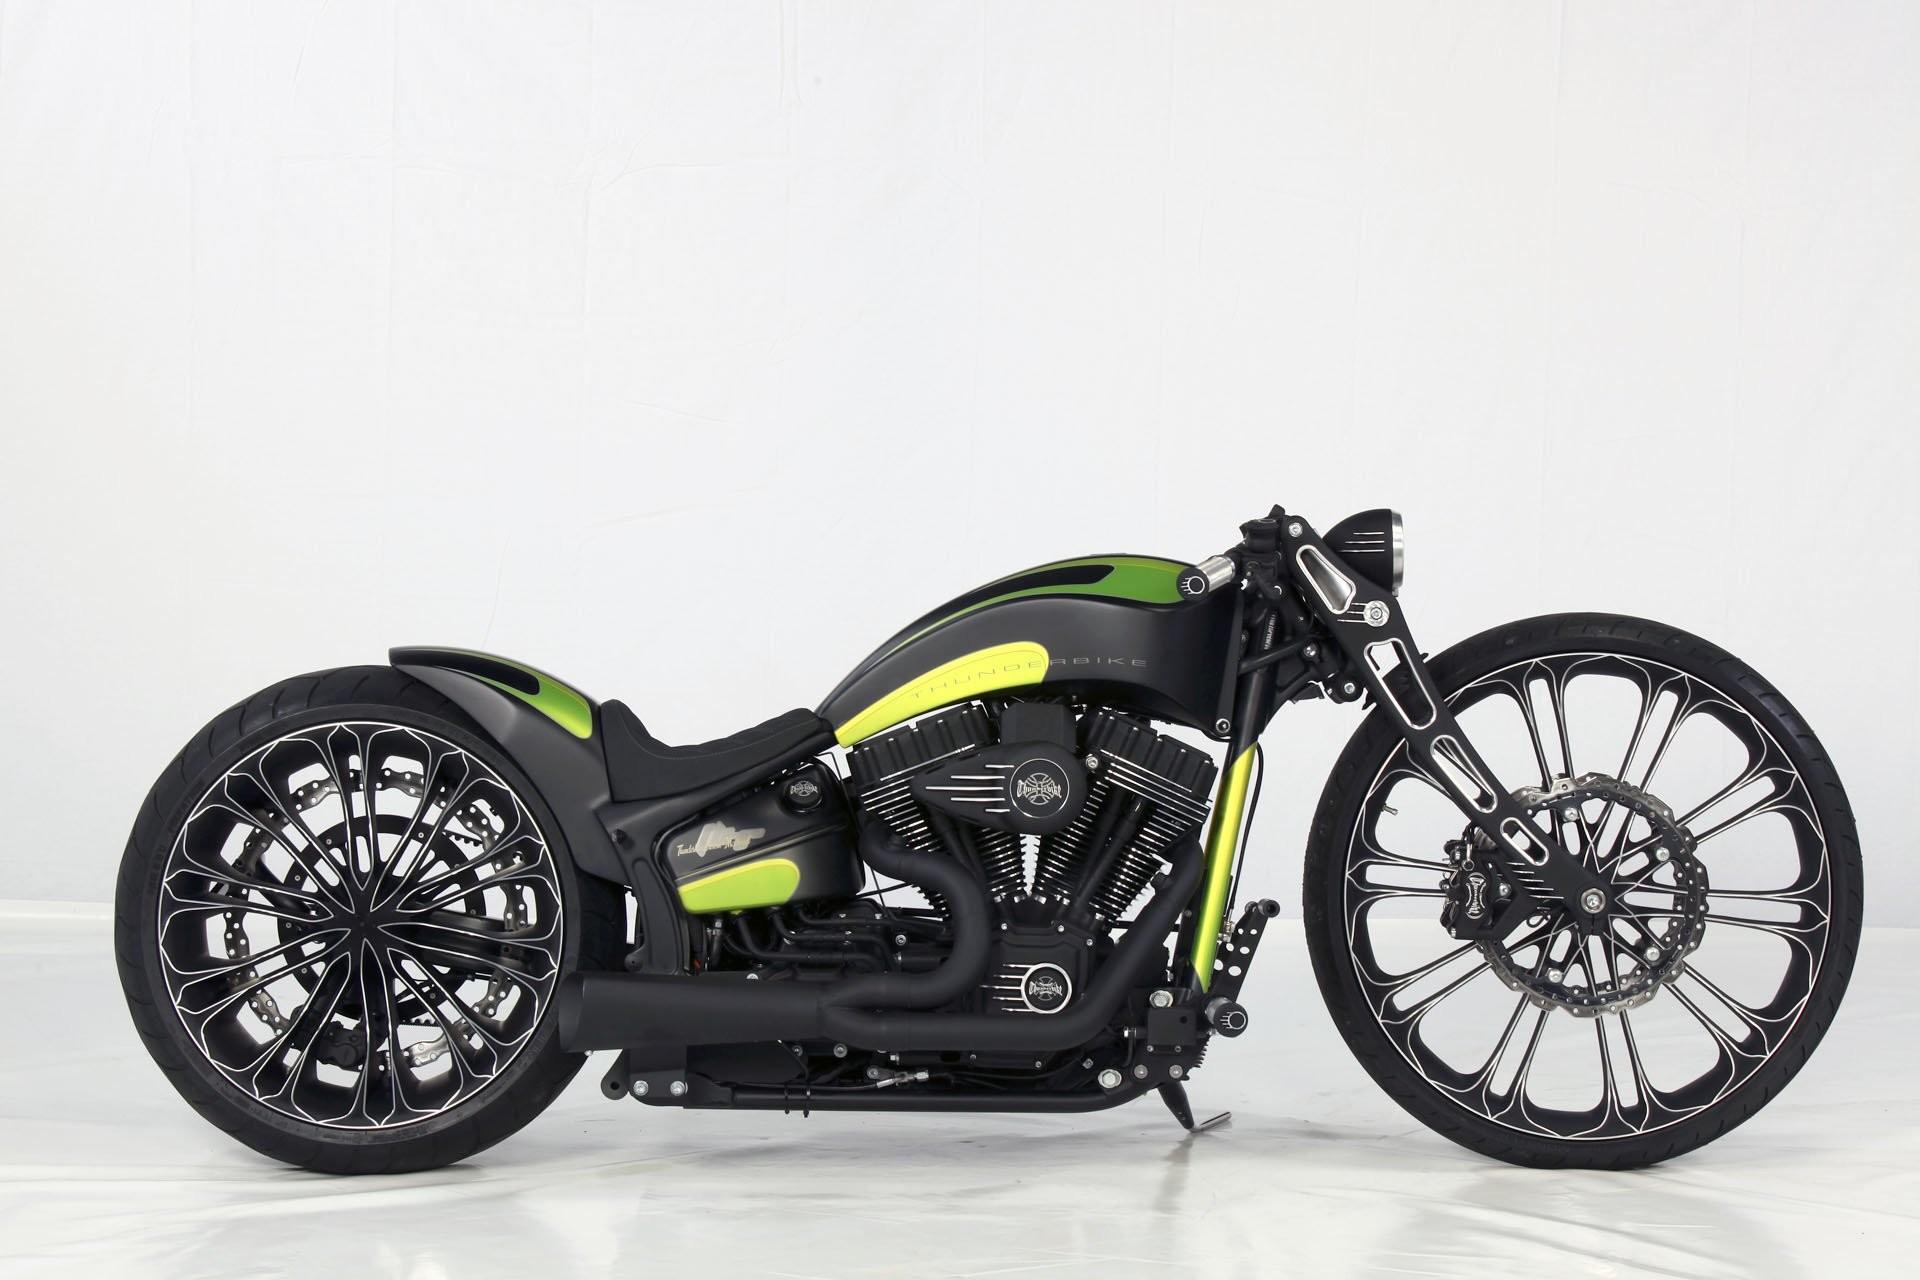 Res: 1920x1280, THUNDERBIKE custom chopper bobber bike 1tbike motorbike motorcycle tuning  wallpaper |  | 744613 | WallpaperUP